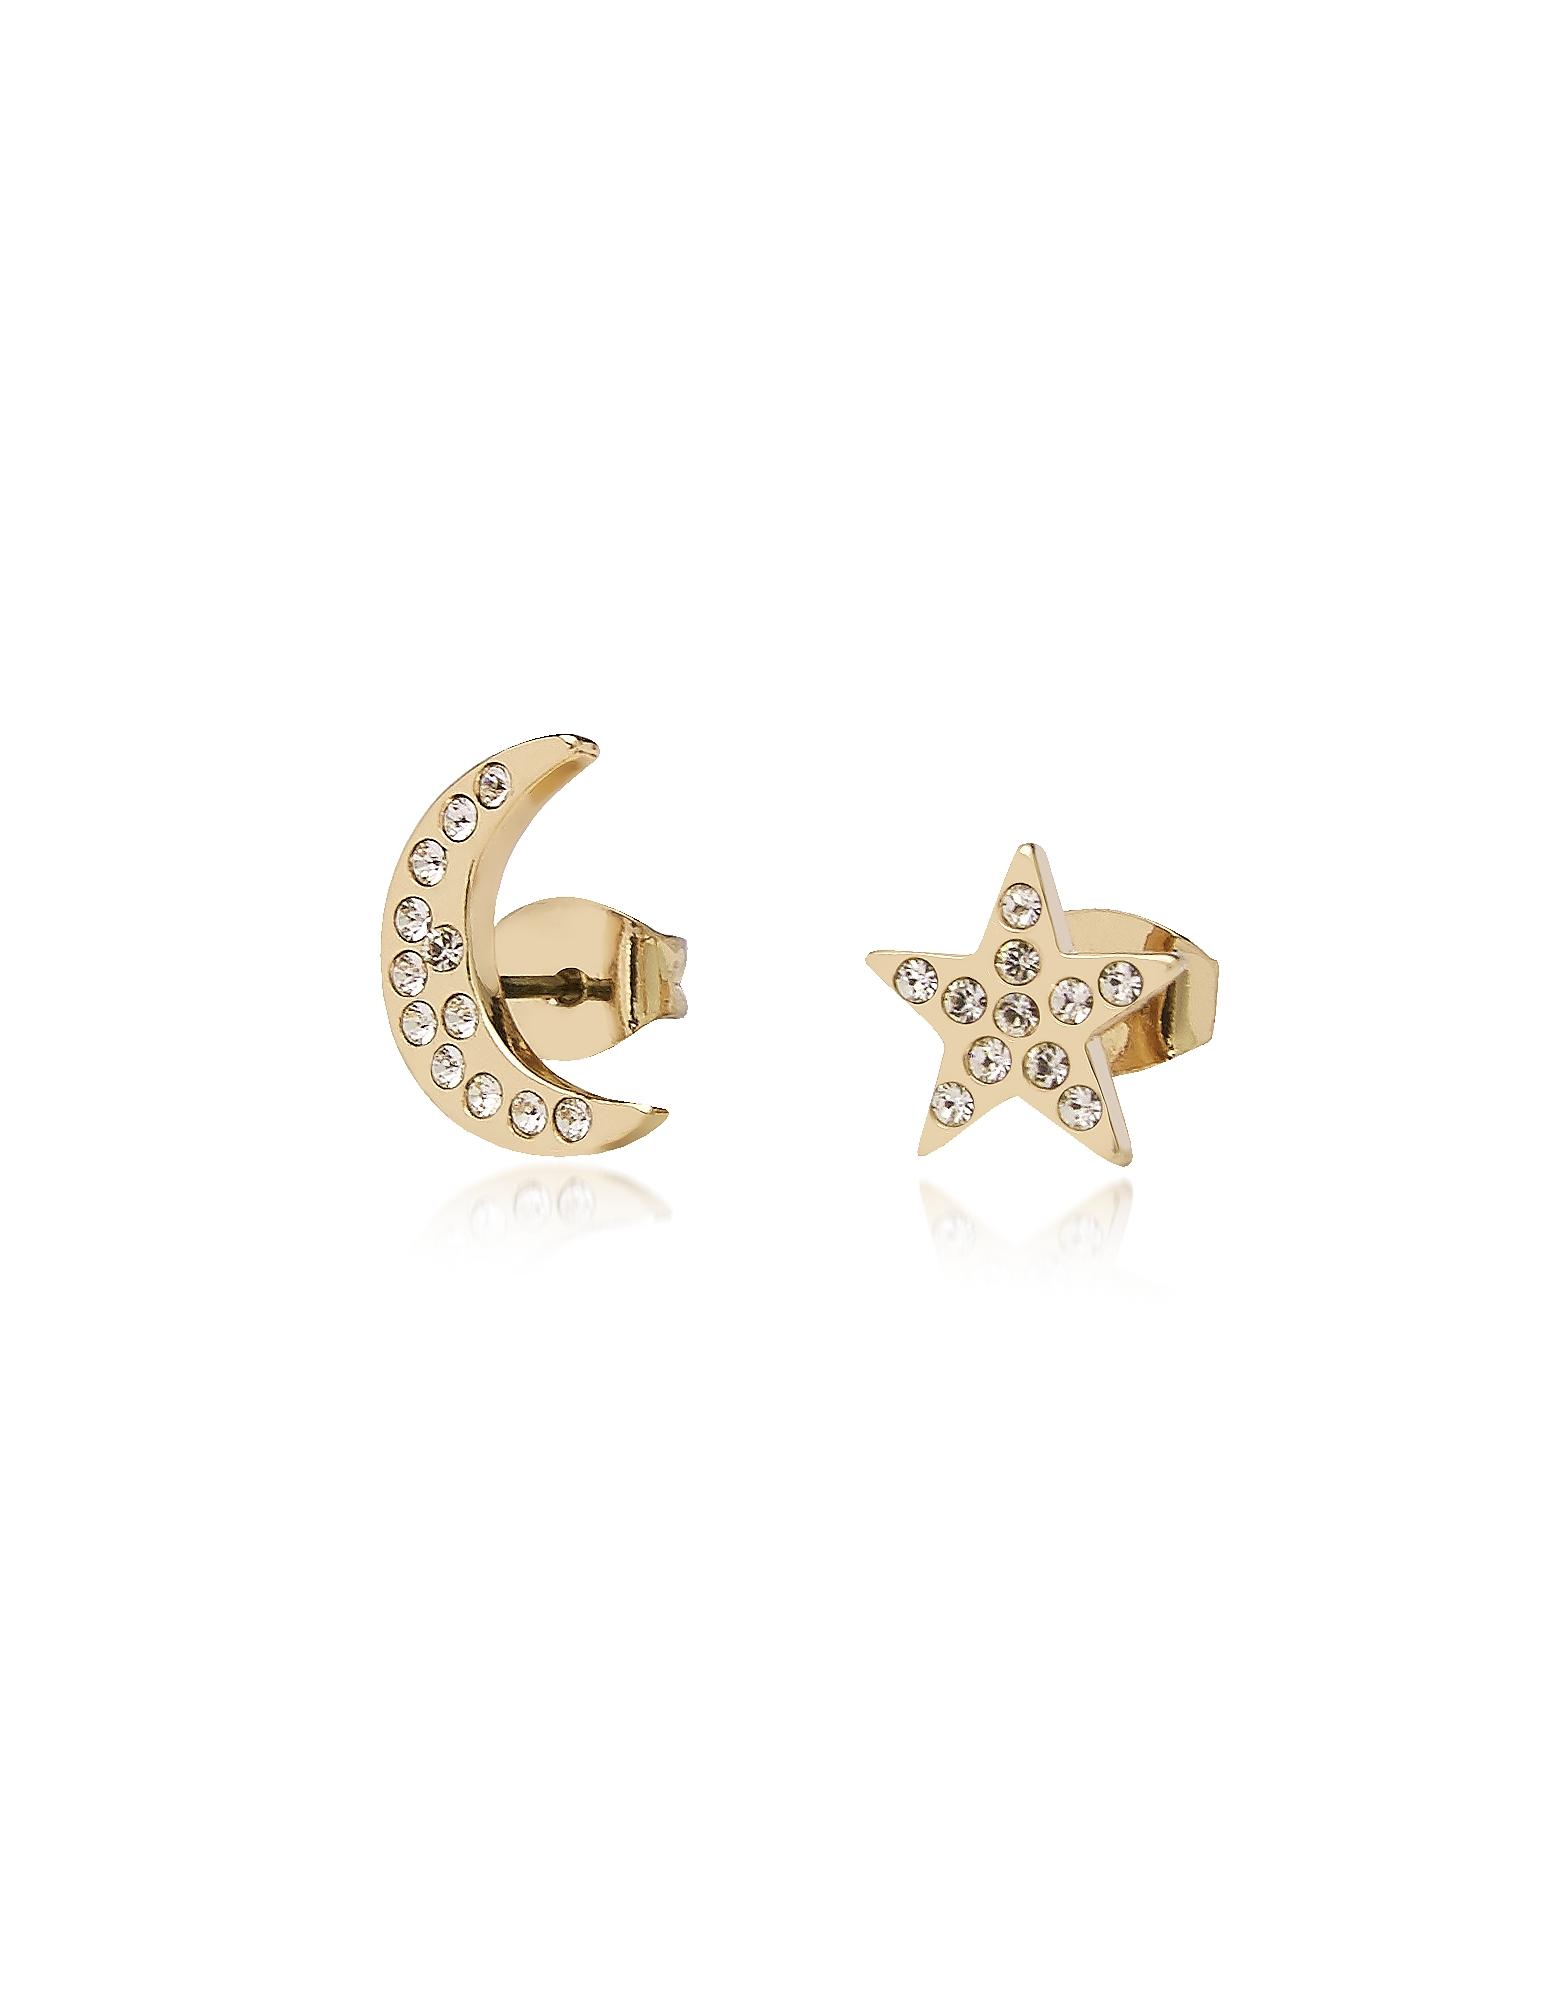 Federica Tosi Earrings, Moon & Stars Earrings